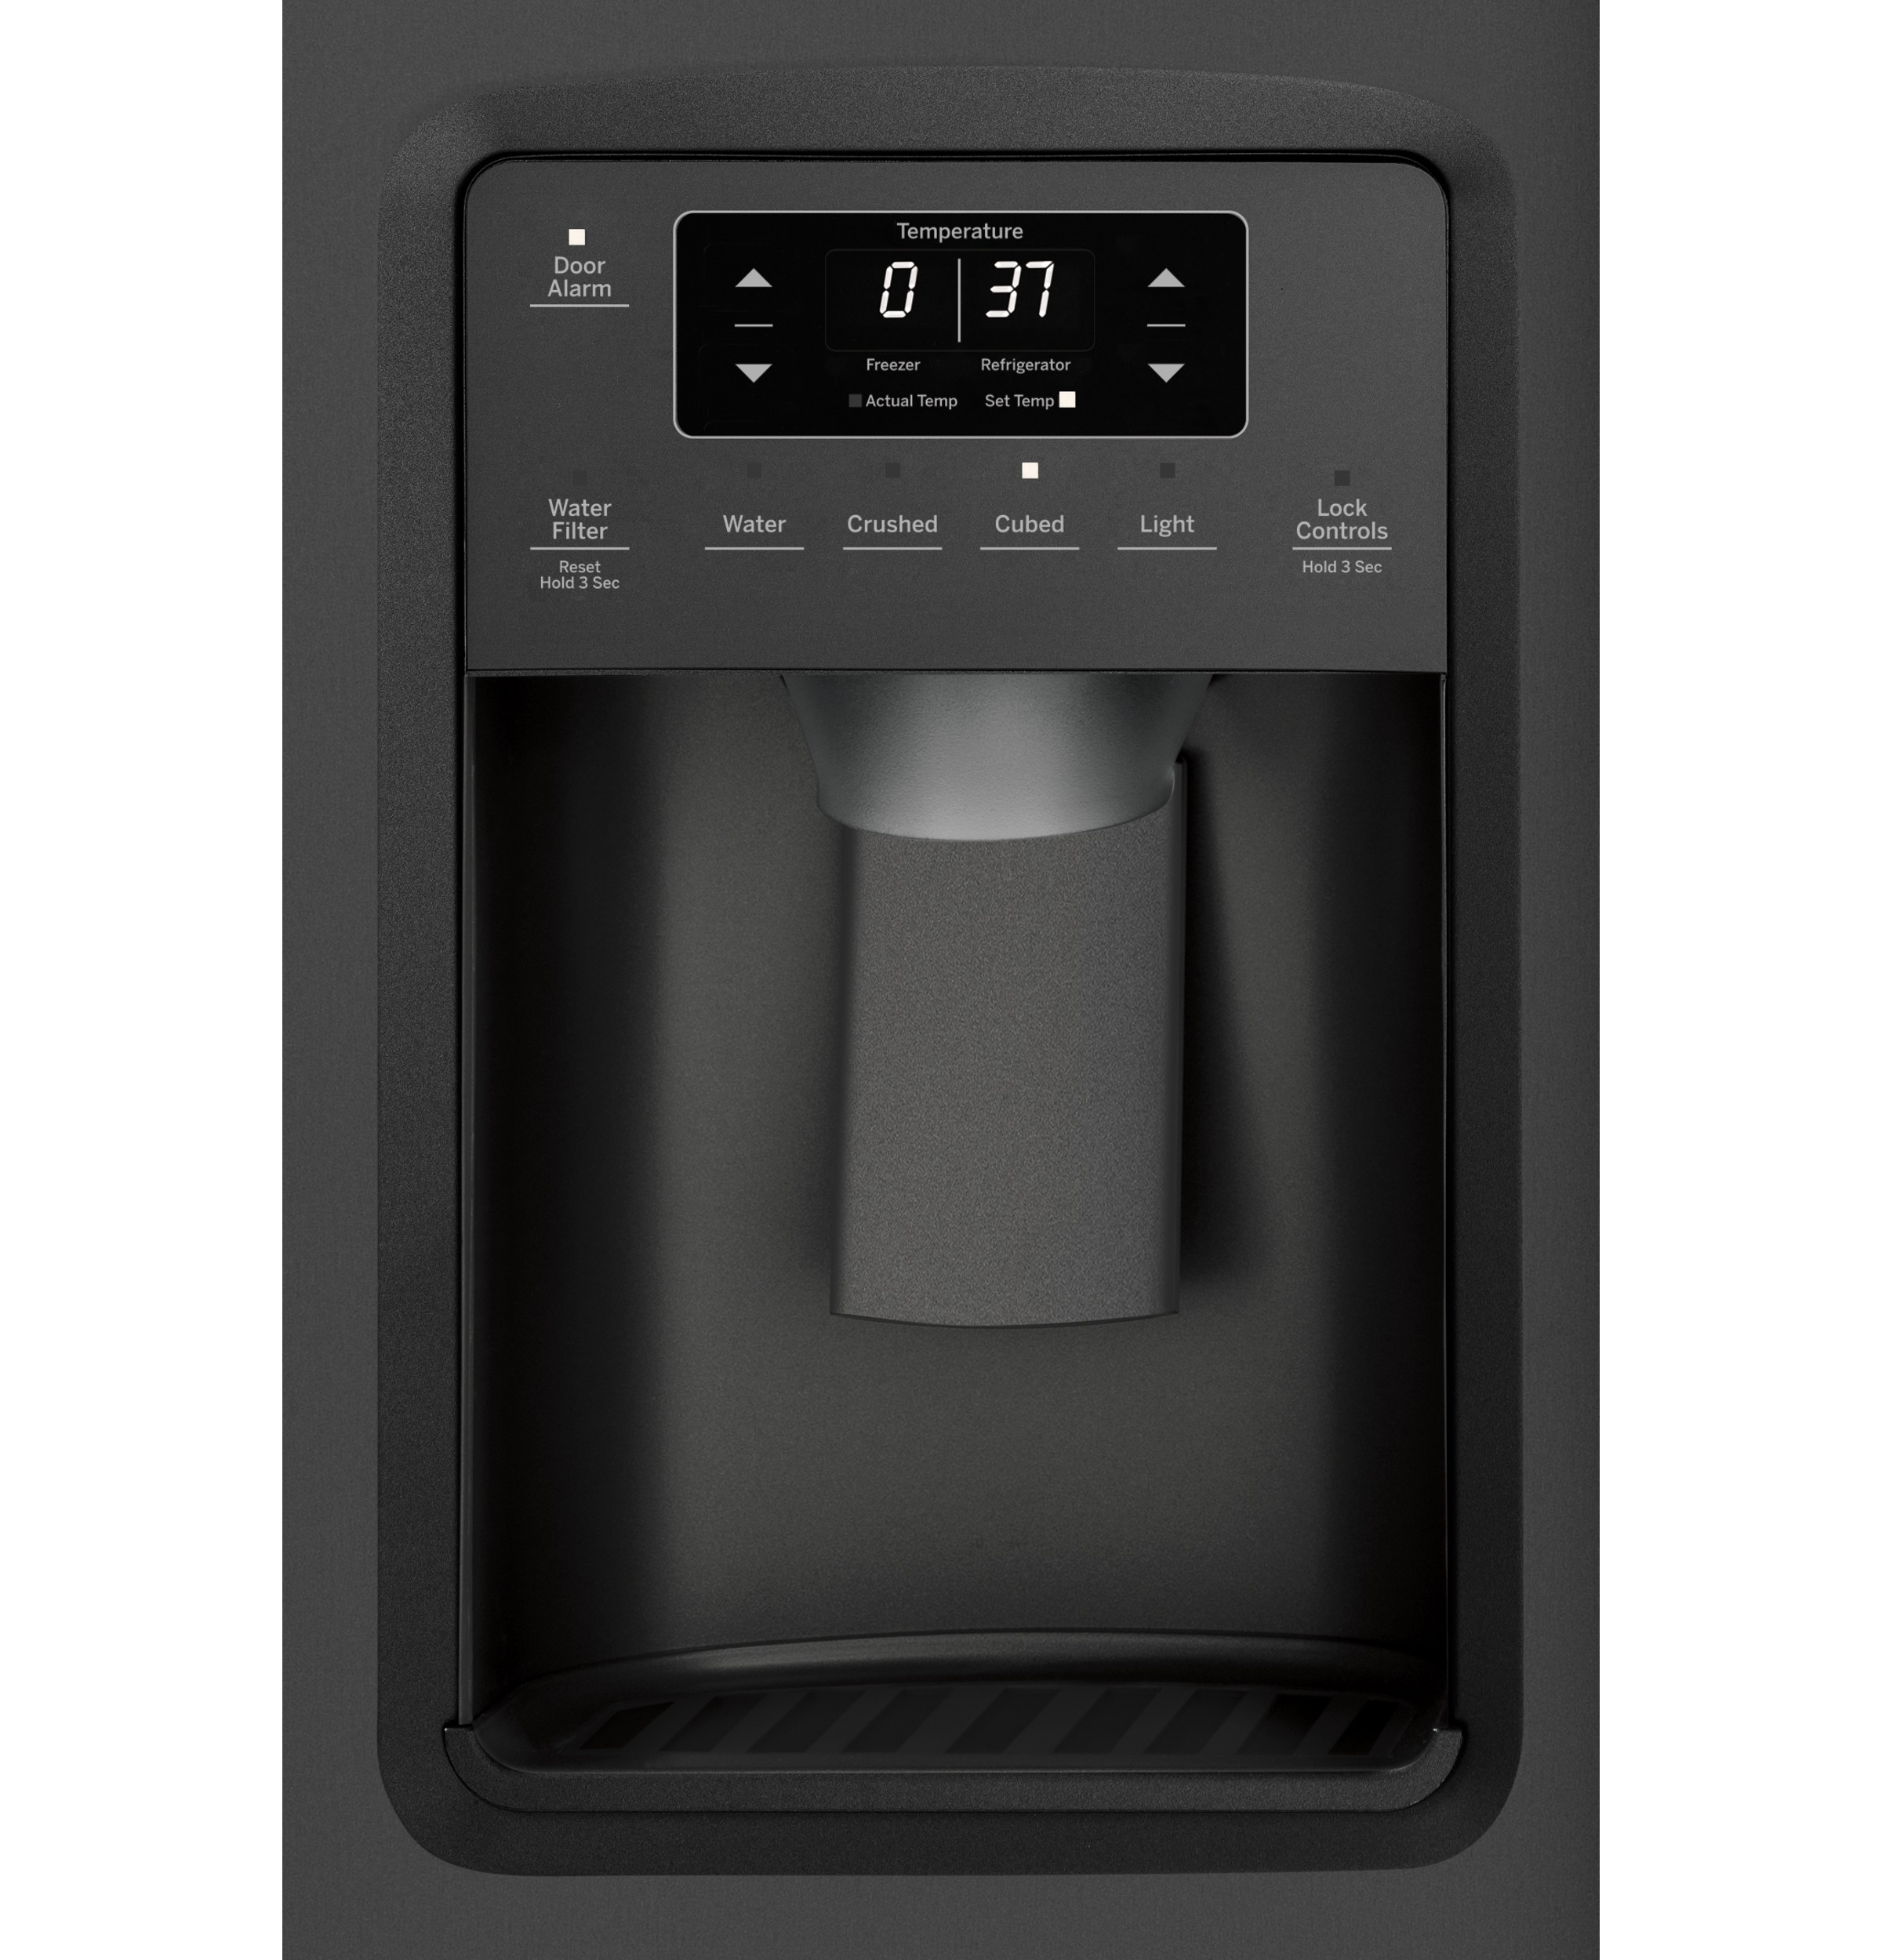 Model: GSS25IENDS | GE GE® 25.1 Cu. Ft. Side-By-Side Refrigerator